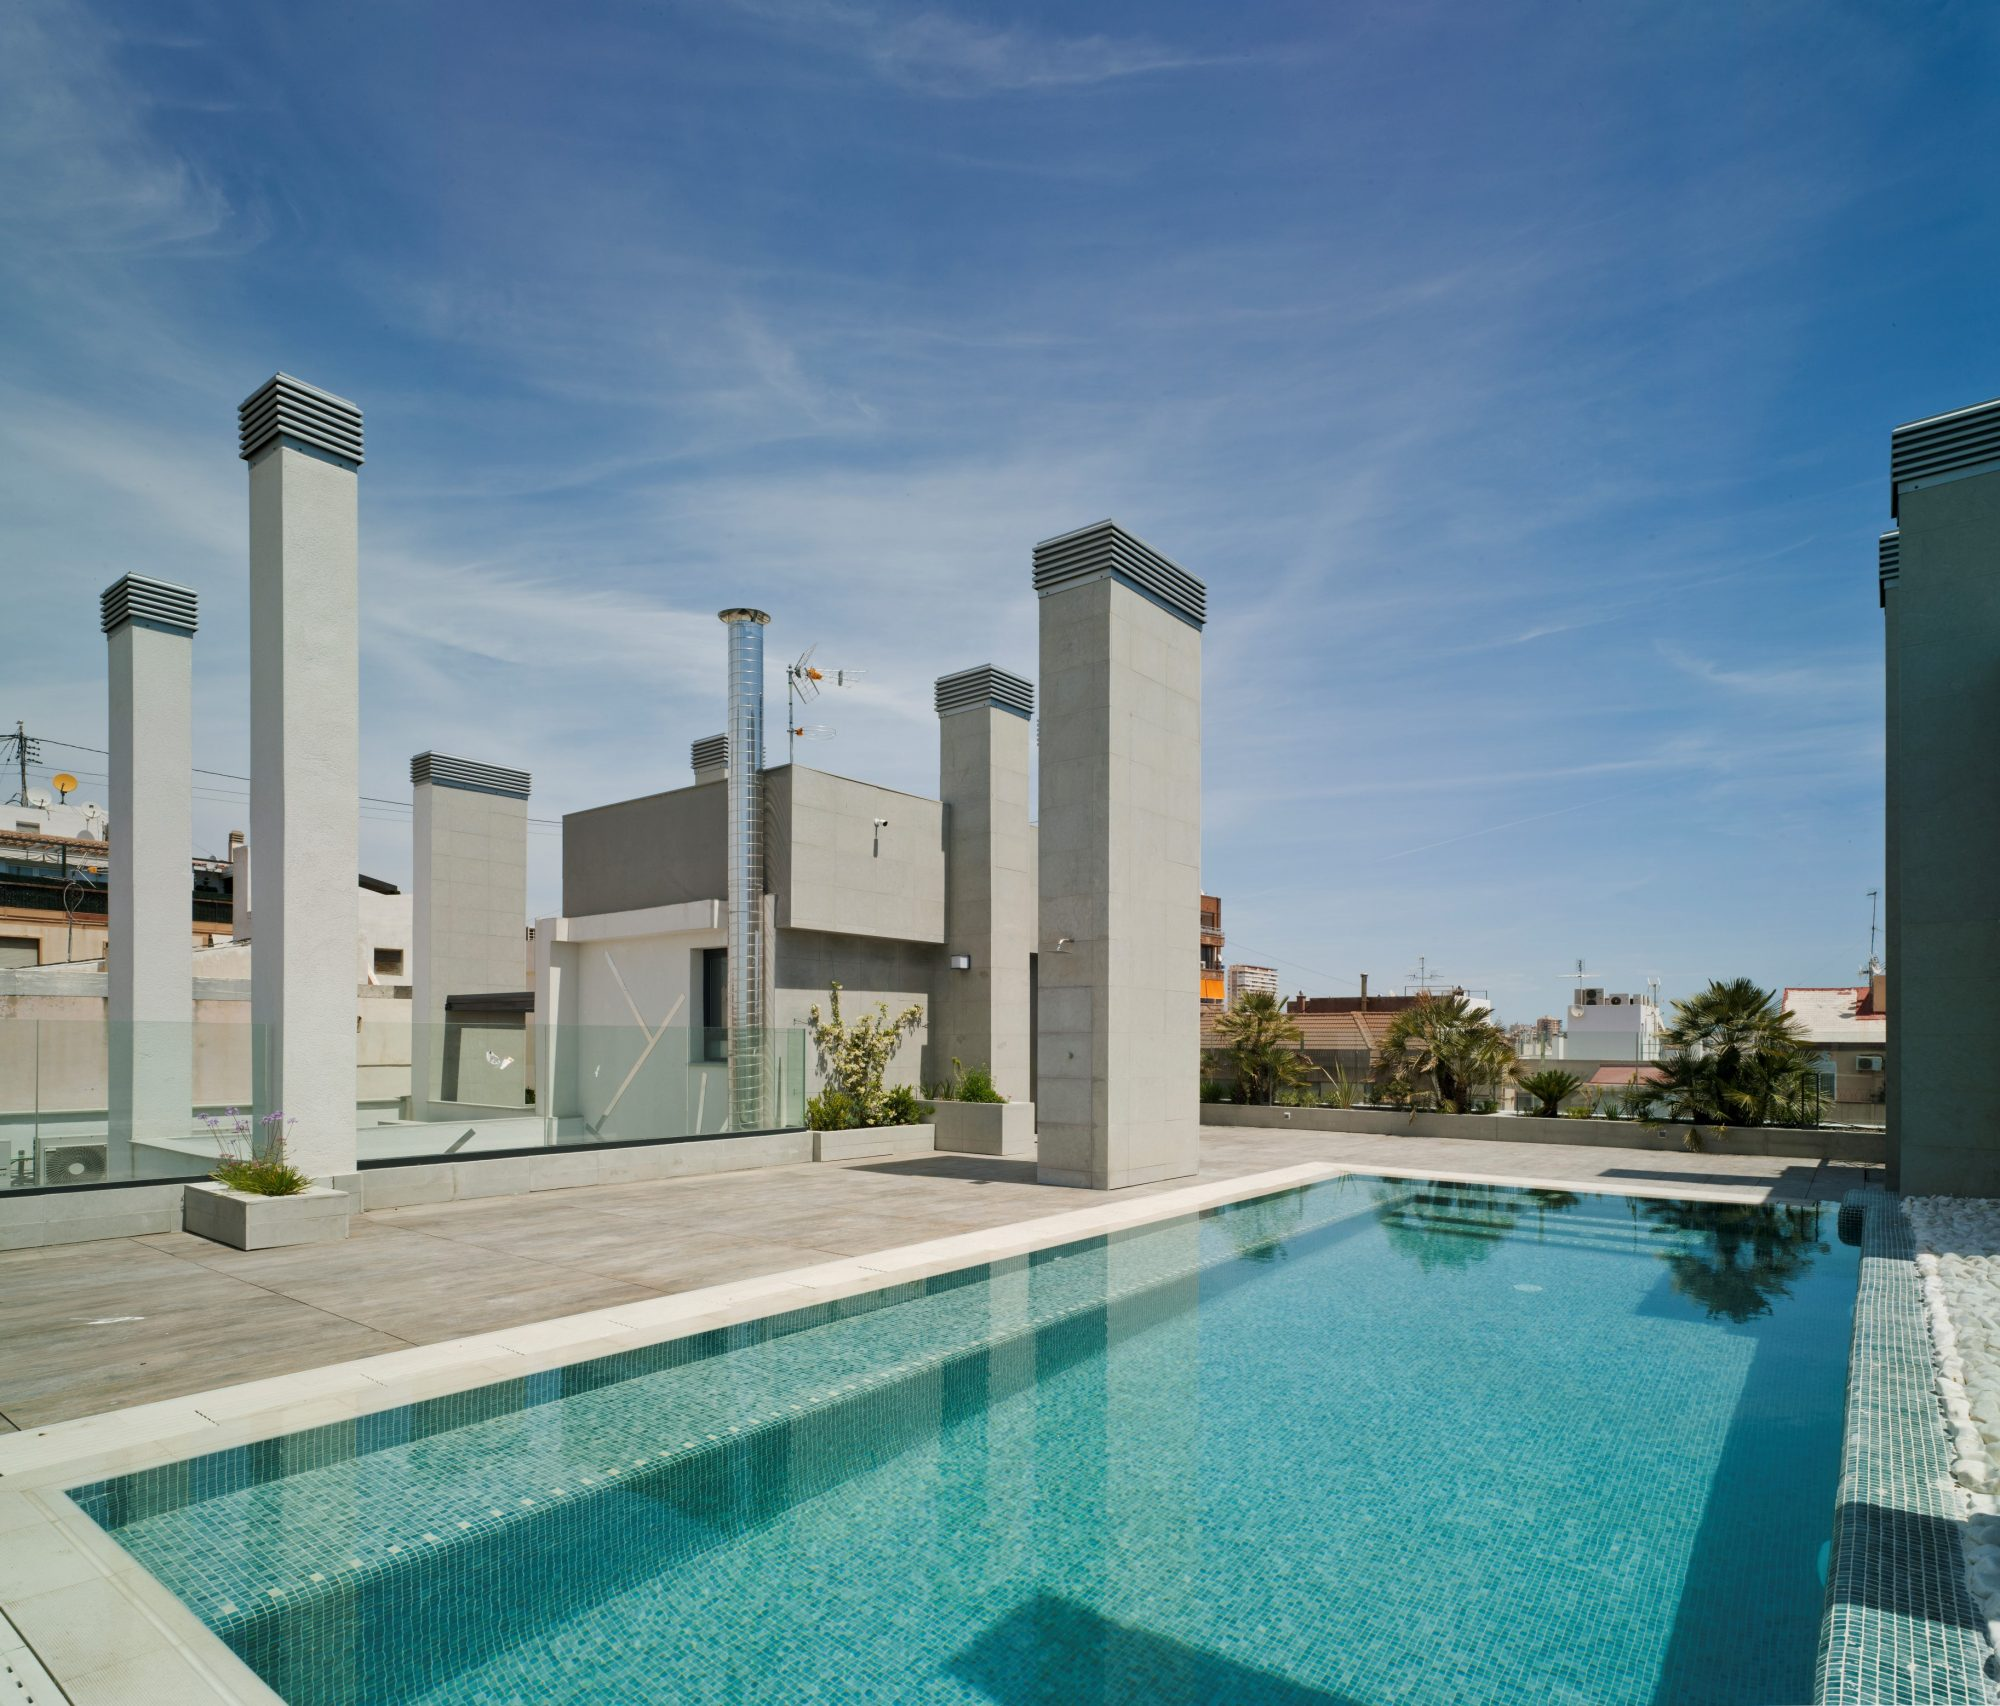 Piscine de l'immeuble Neuf d'Alicante